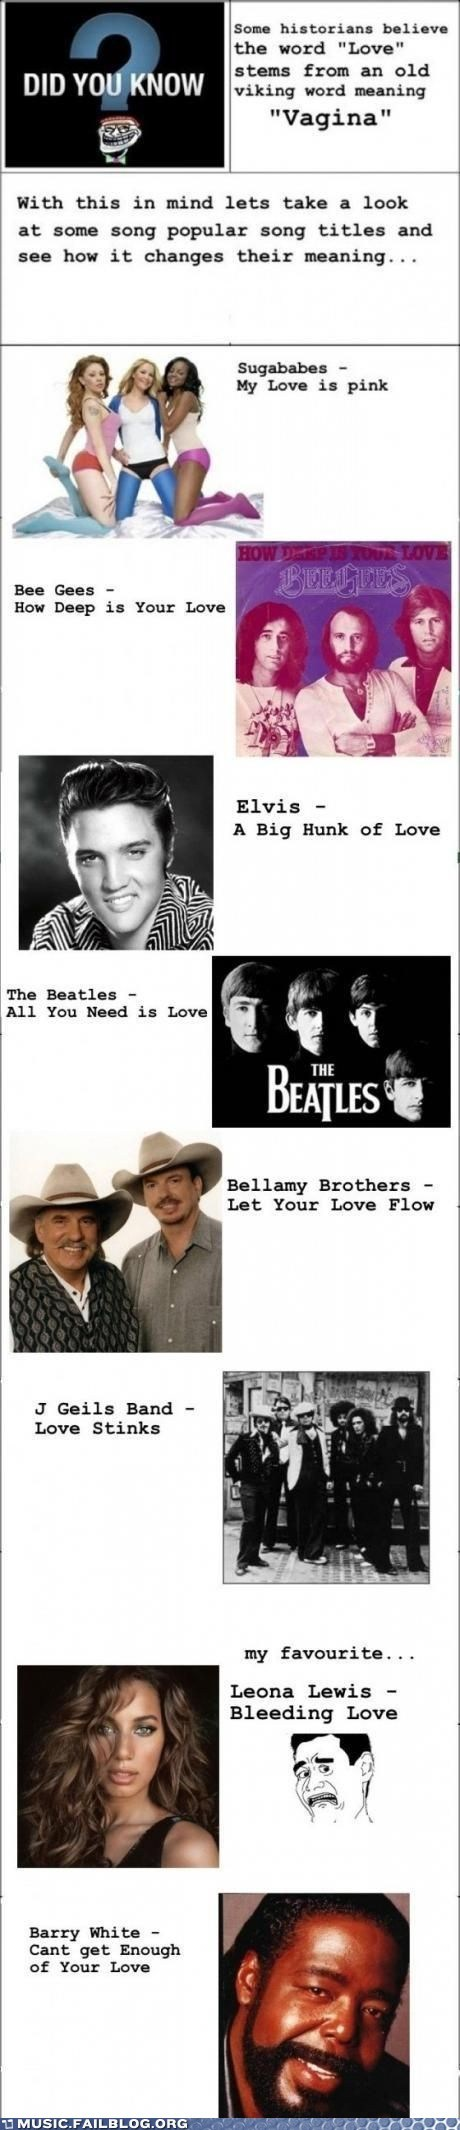 Elvis Presley love lyrics song titles the Beatles troll - 6537842944